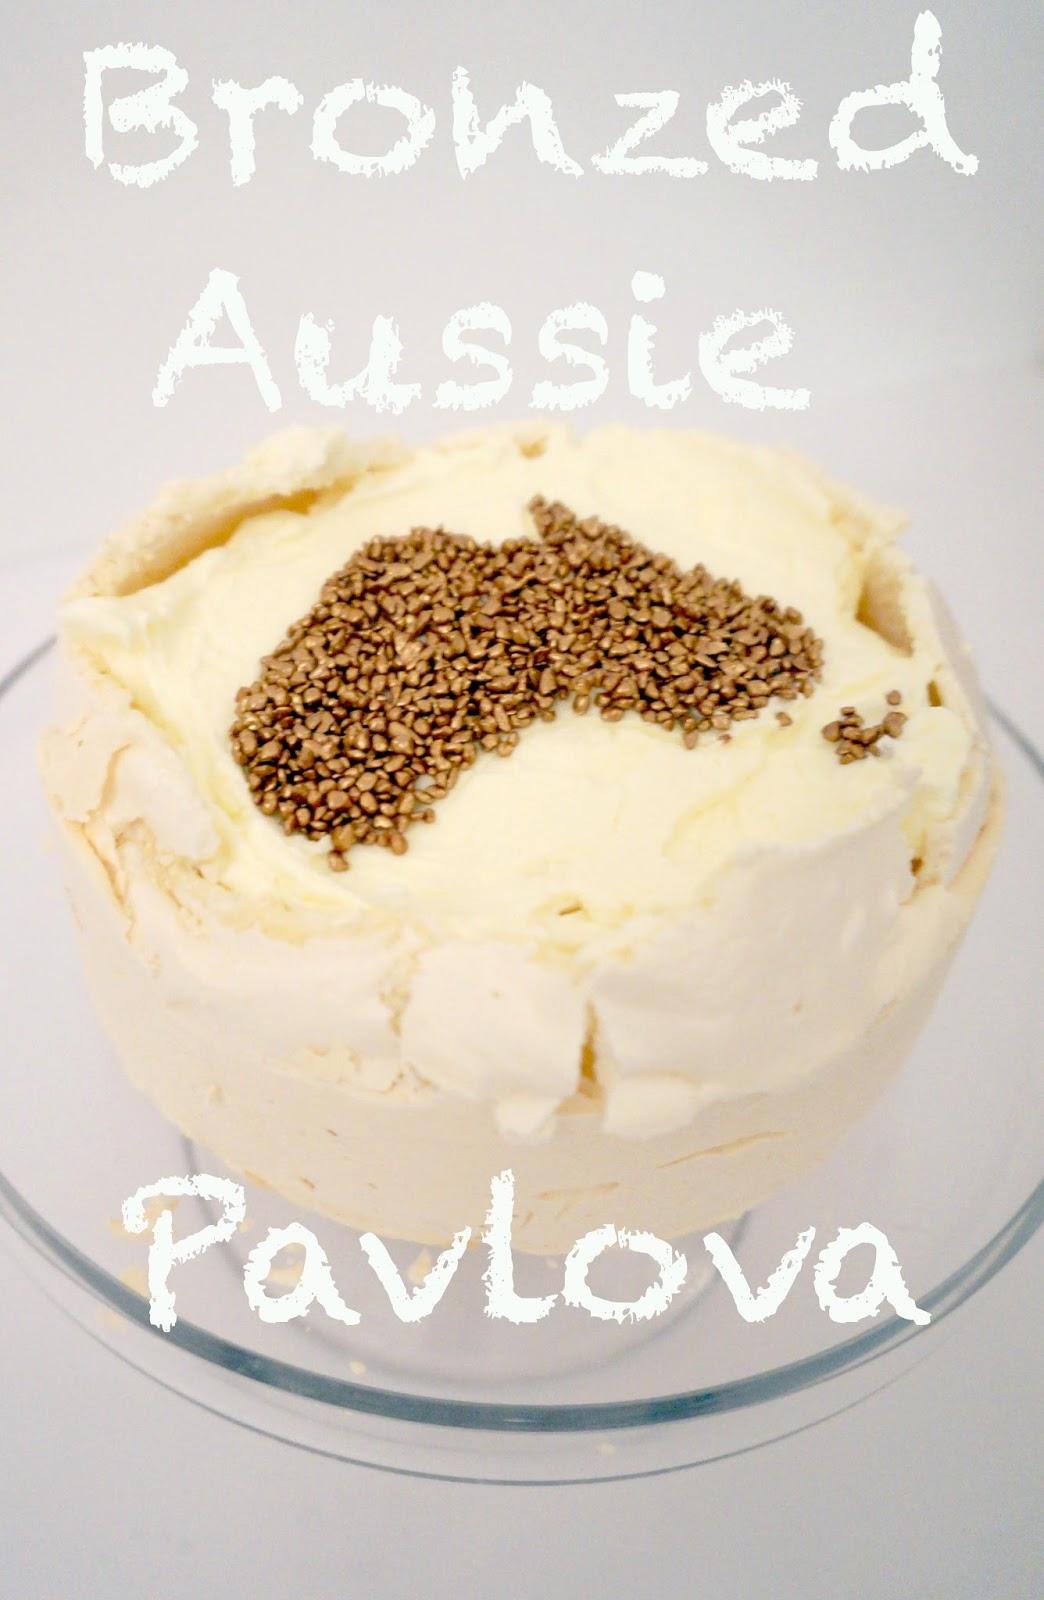 meg-made: Bronzed Aussie Pavlova